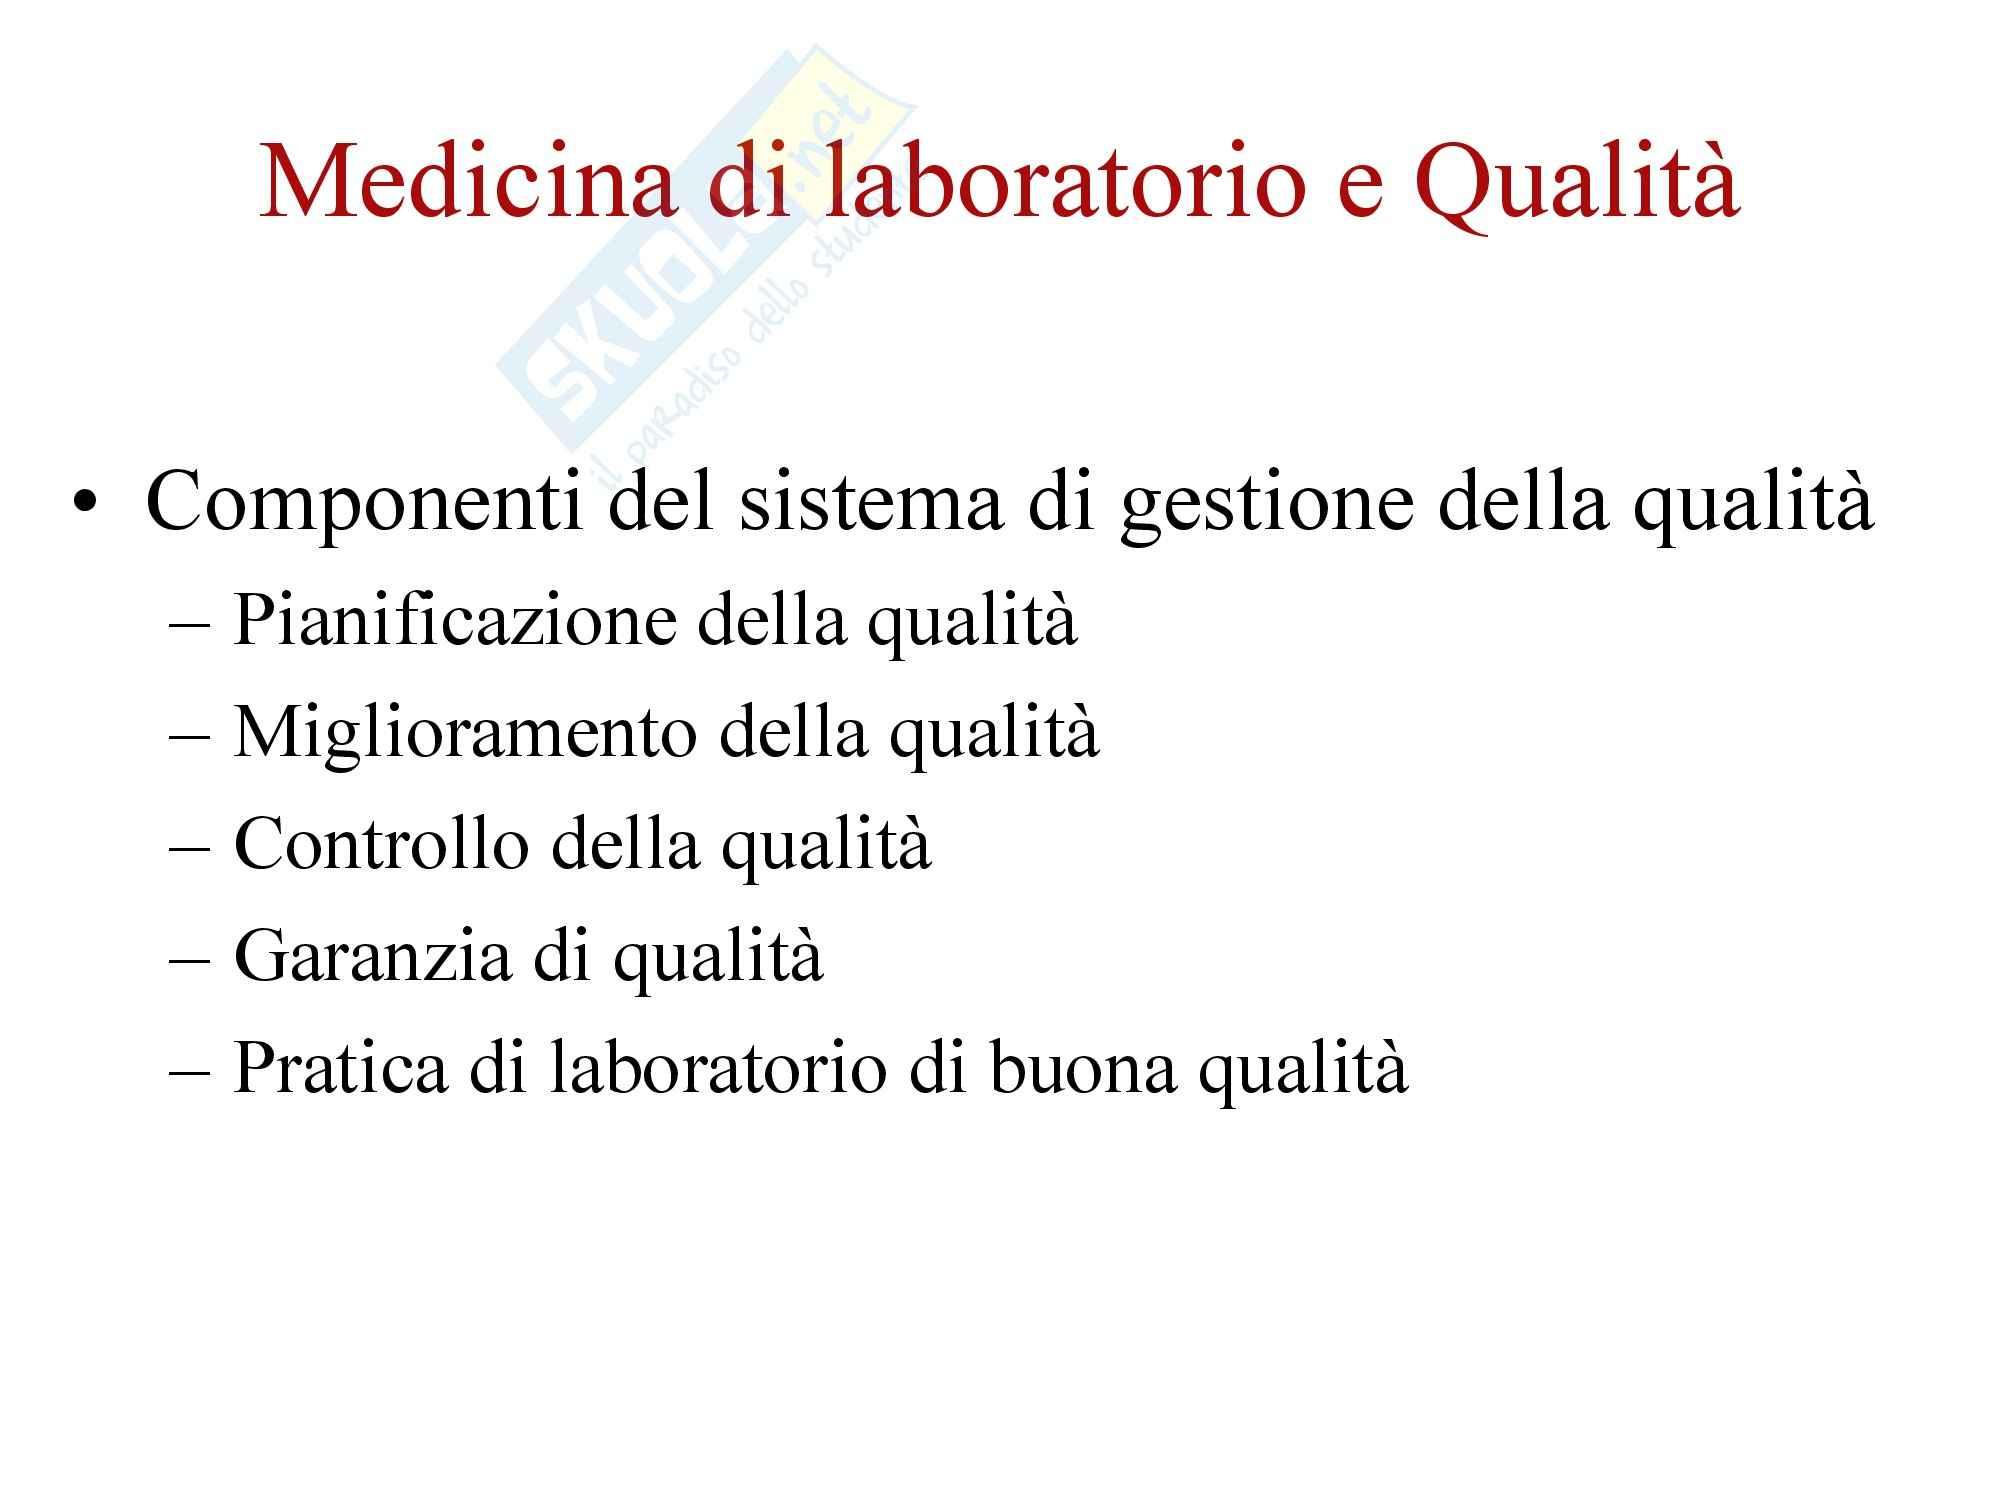 Biochimica Clinica e patologia clinica - Introduzione Pag. 2